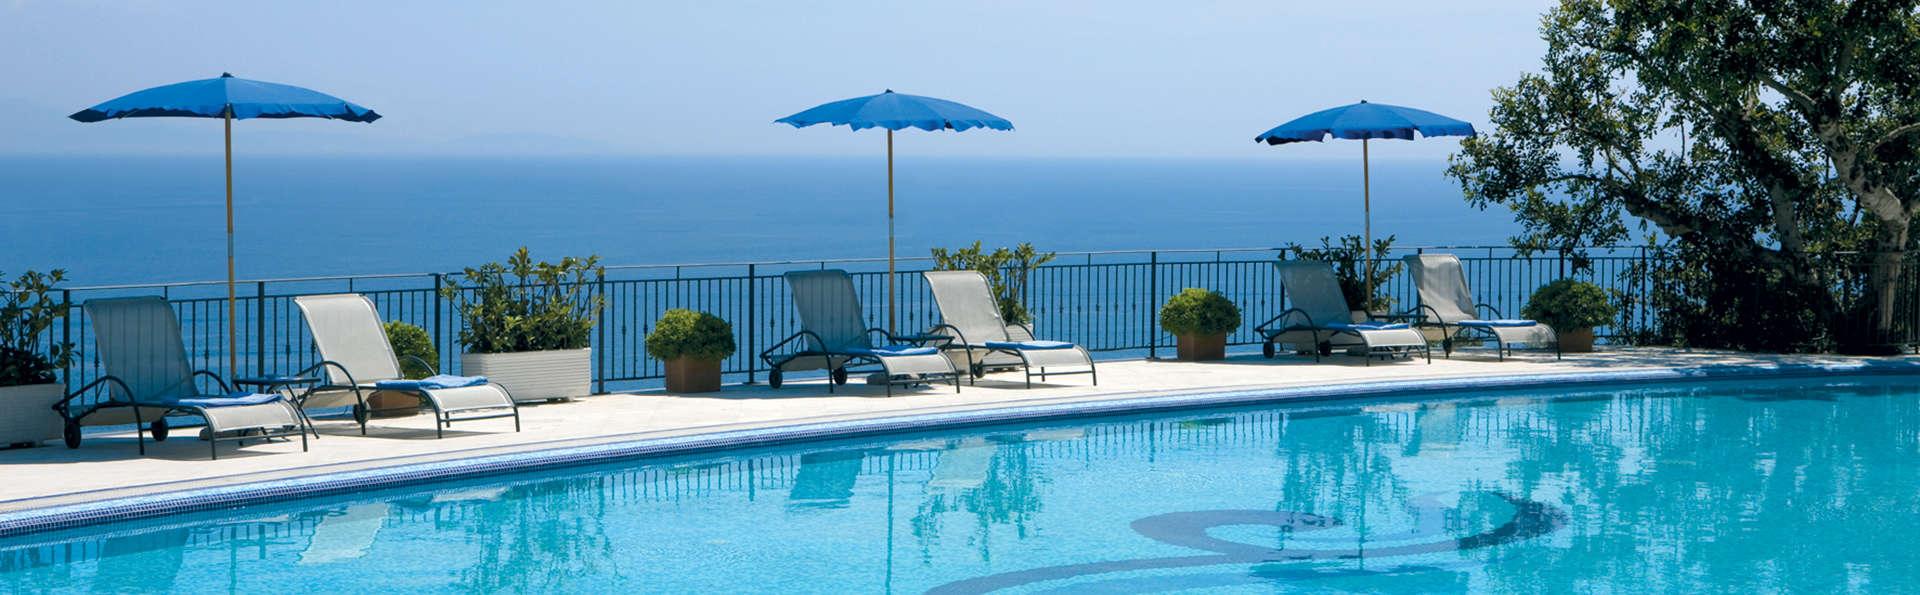 Hotel Raito Wellness & Spa - Edit_Pool3.jpg